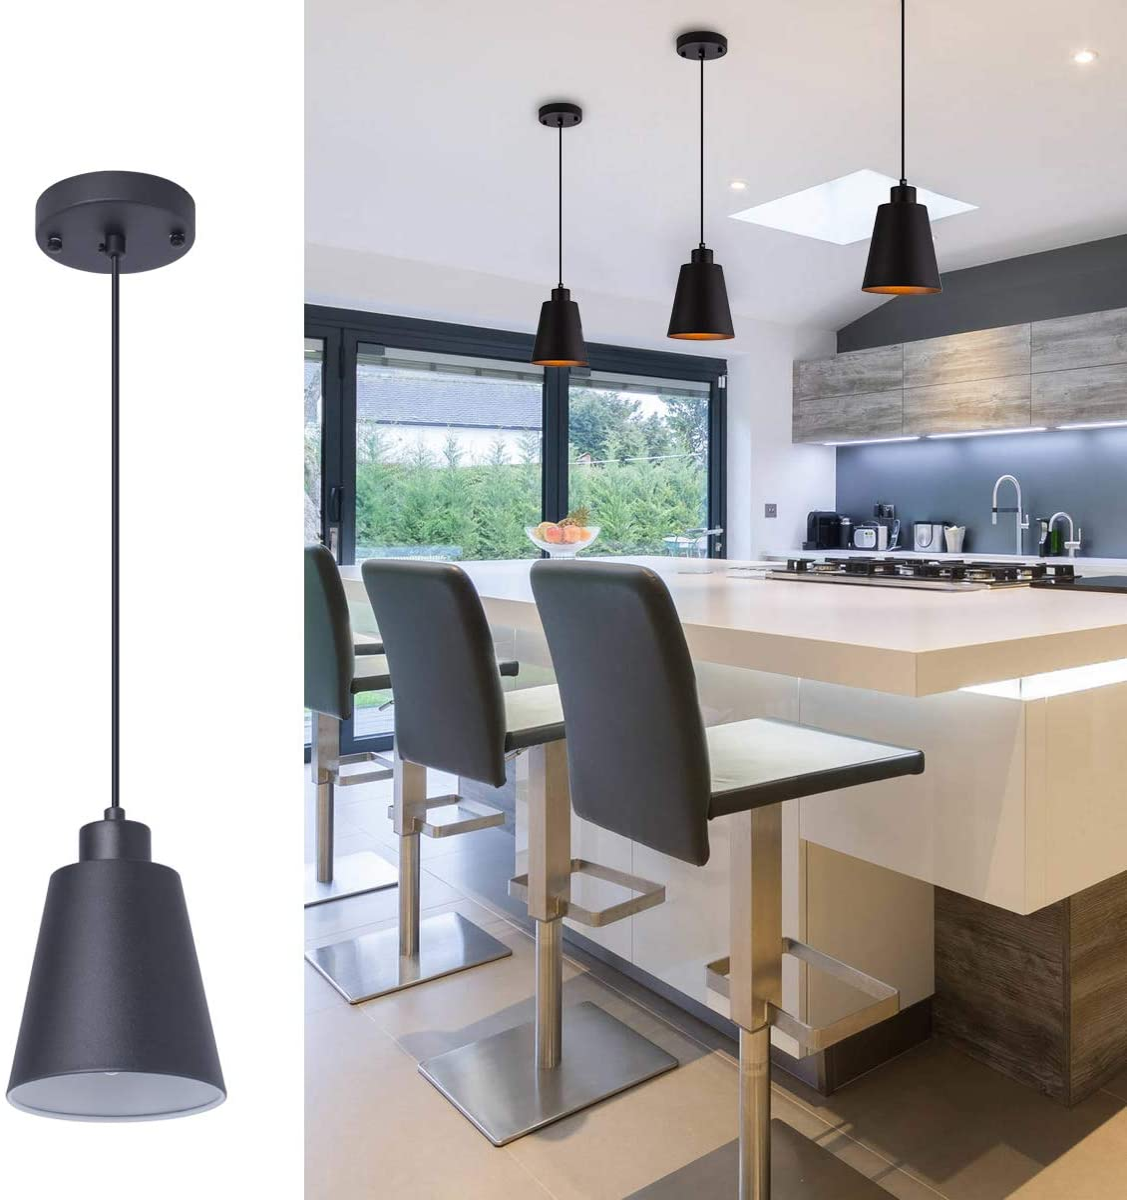 Black Pendant Light Kitchen Island Pendant Lighting with 9.9in Metal Shade  Modern Hanging Light for Kitchen Small Pendant Light Fixture for Dining ...